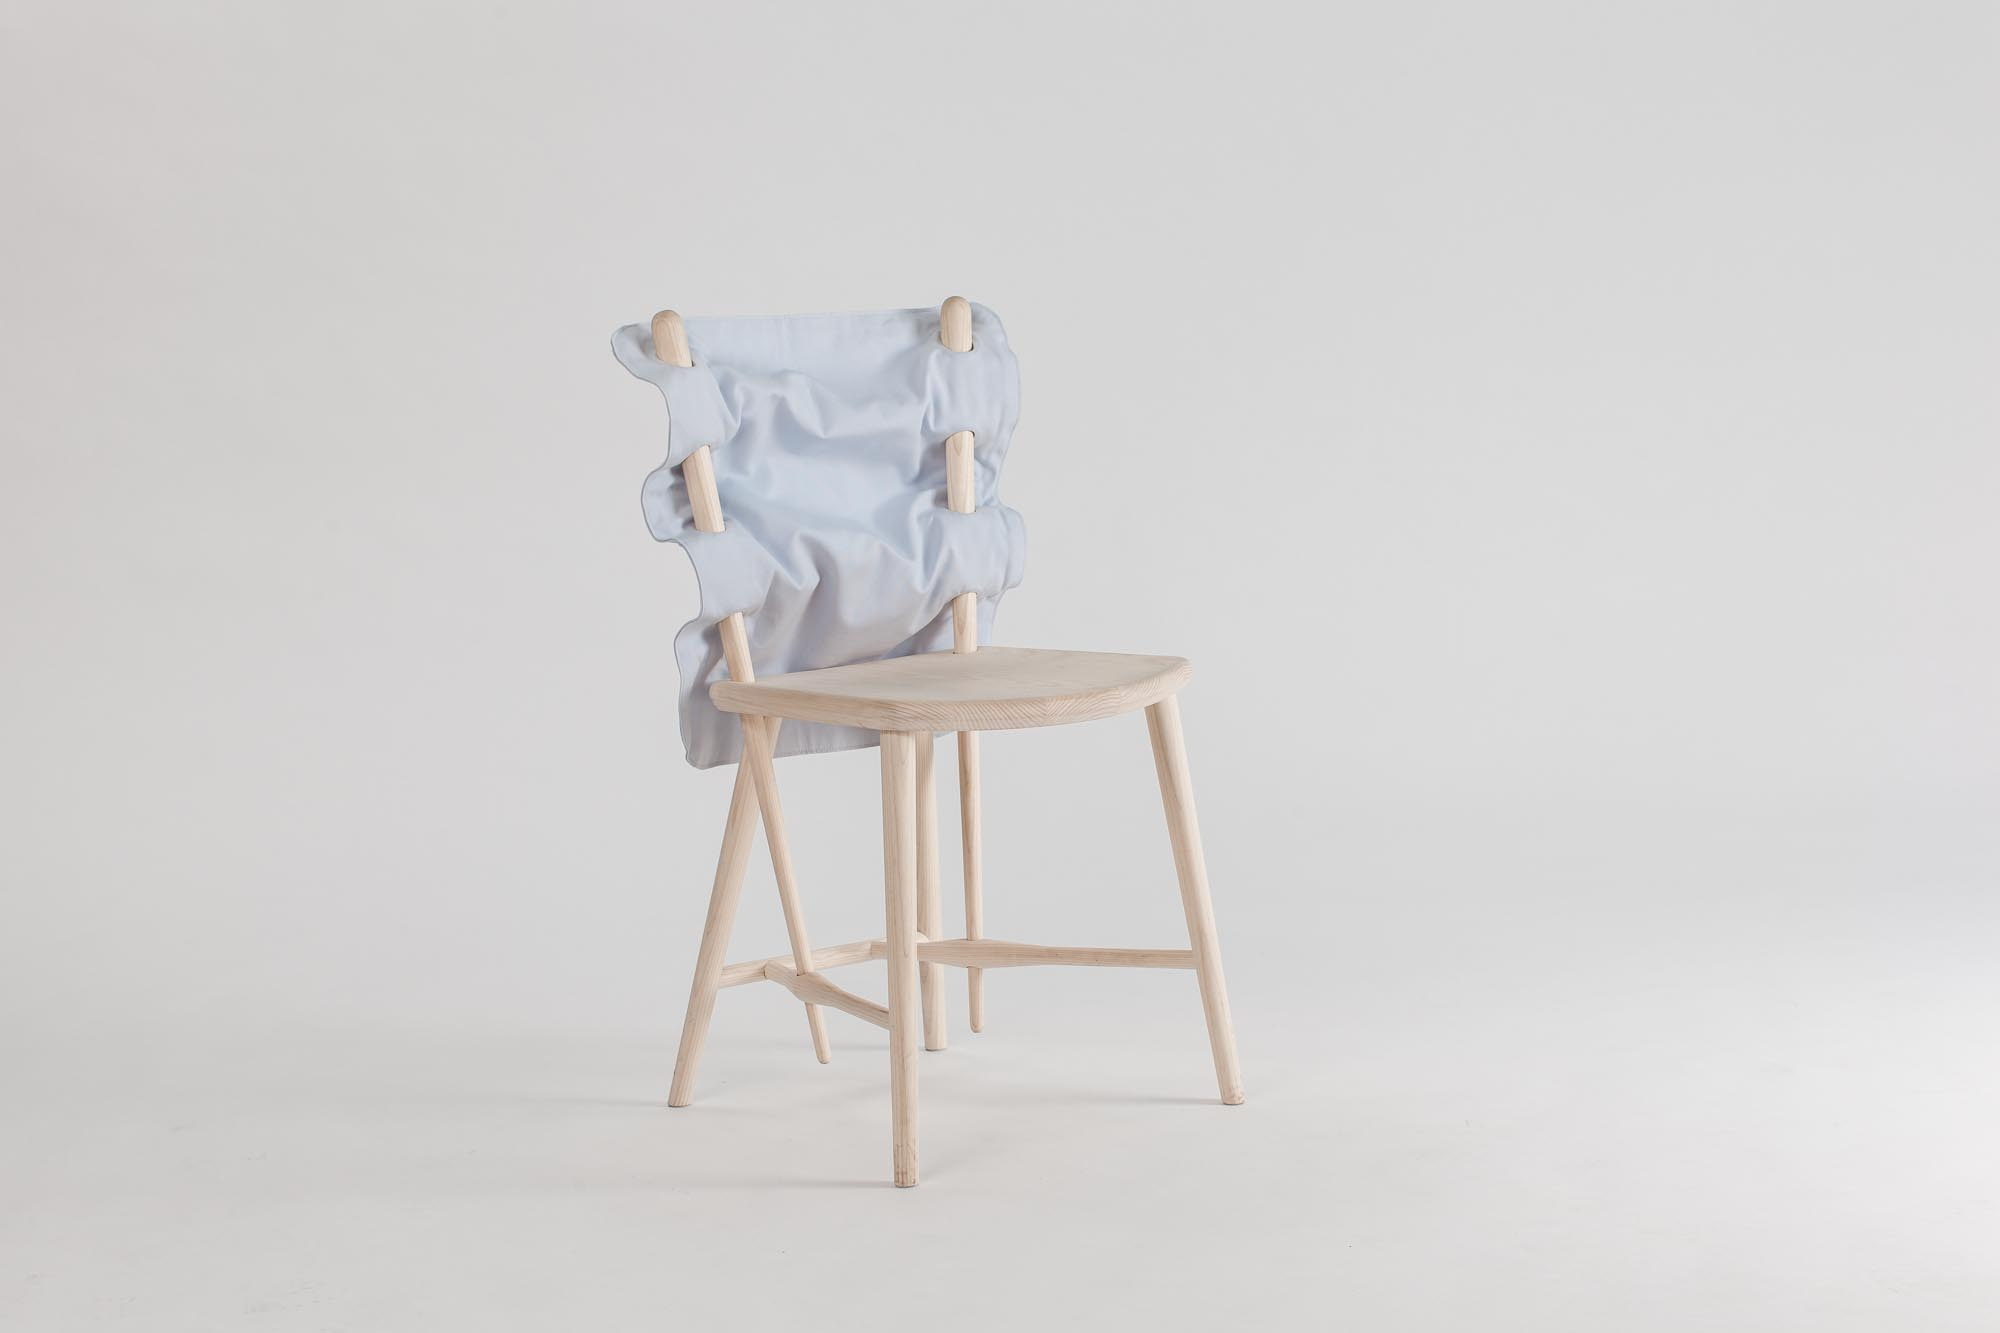 Eva-Fly_Needle-Chair_08